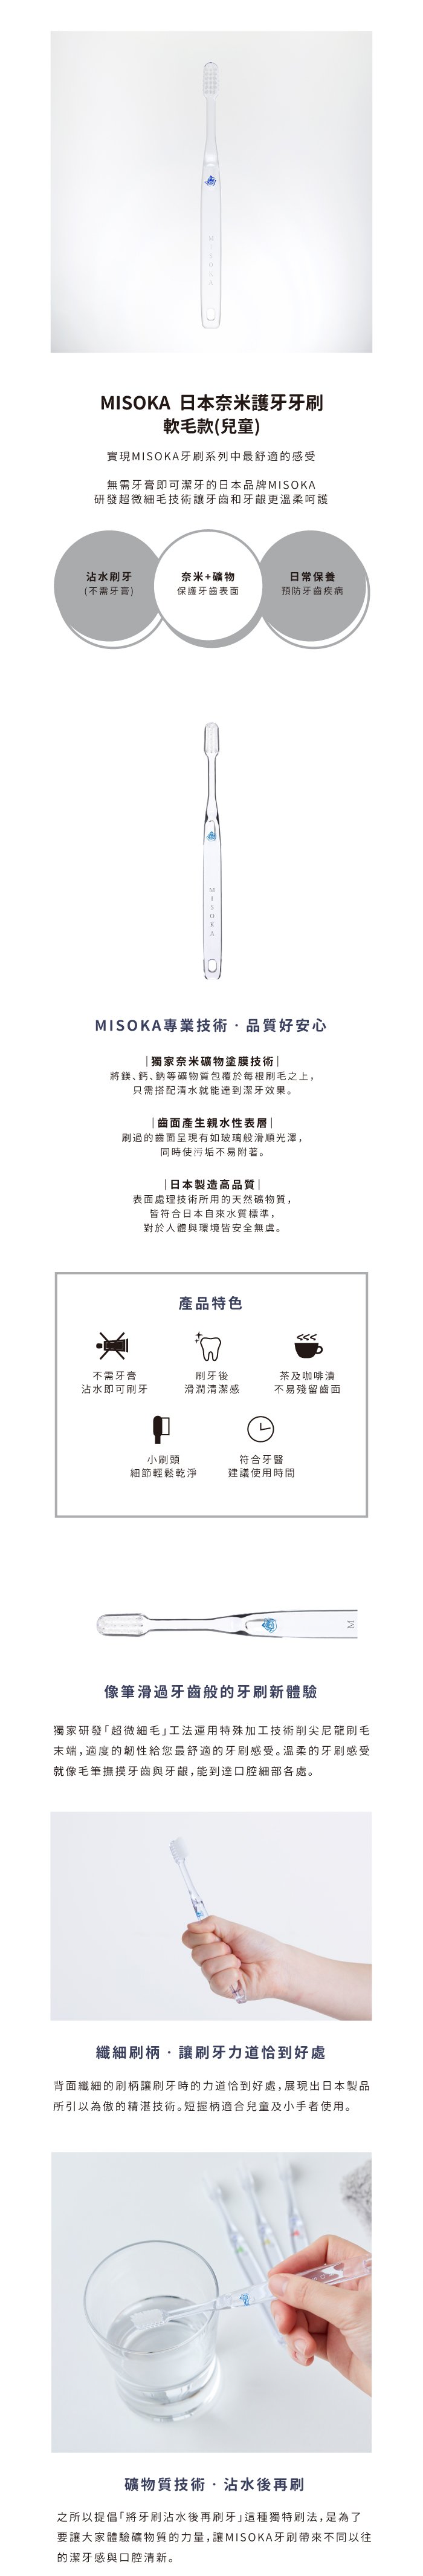 MISOKA │ COMFORT 軟毛款頂級免沾牙膏牙刷 (日本製 / 若草色 / 兒童)